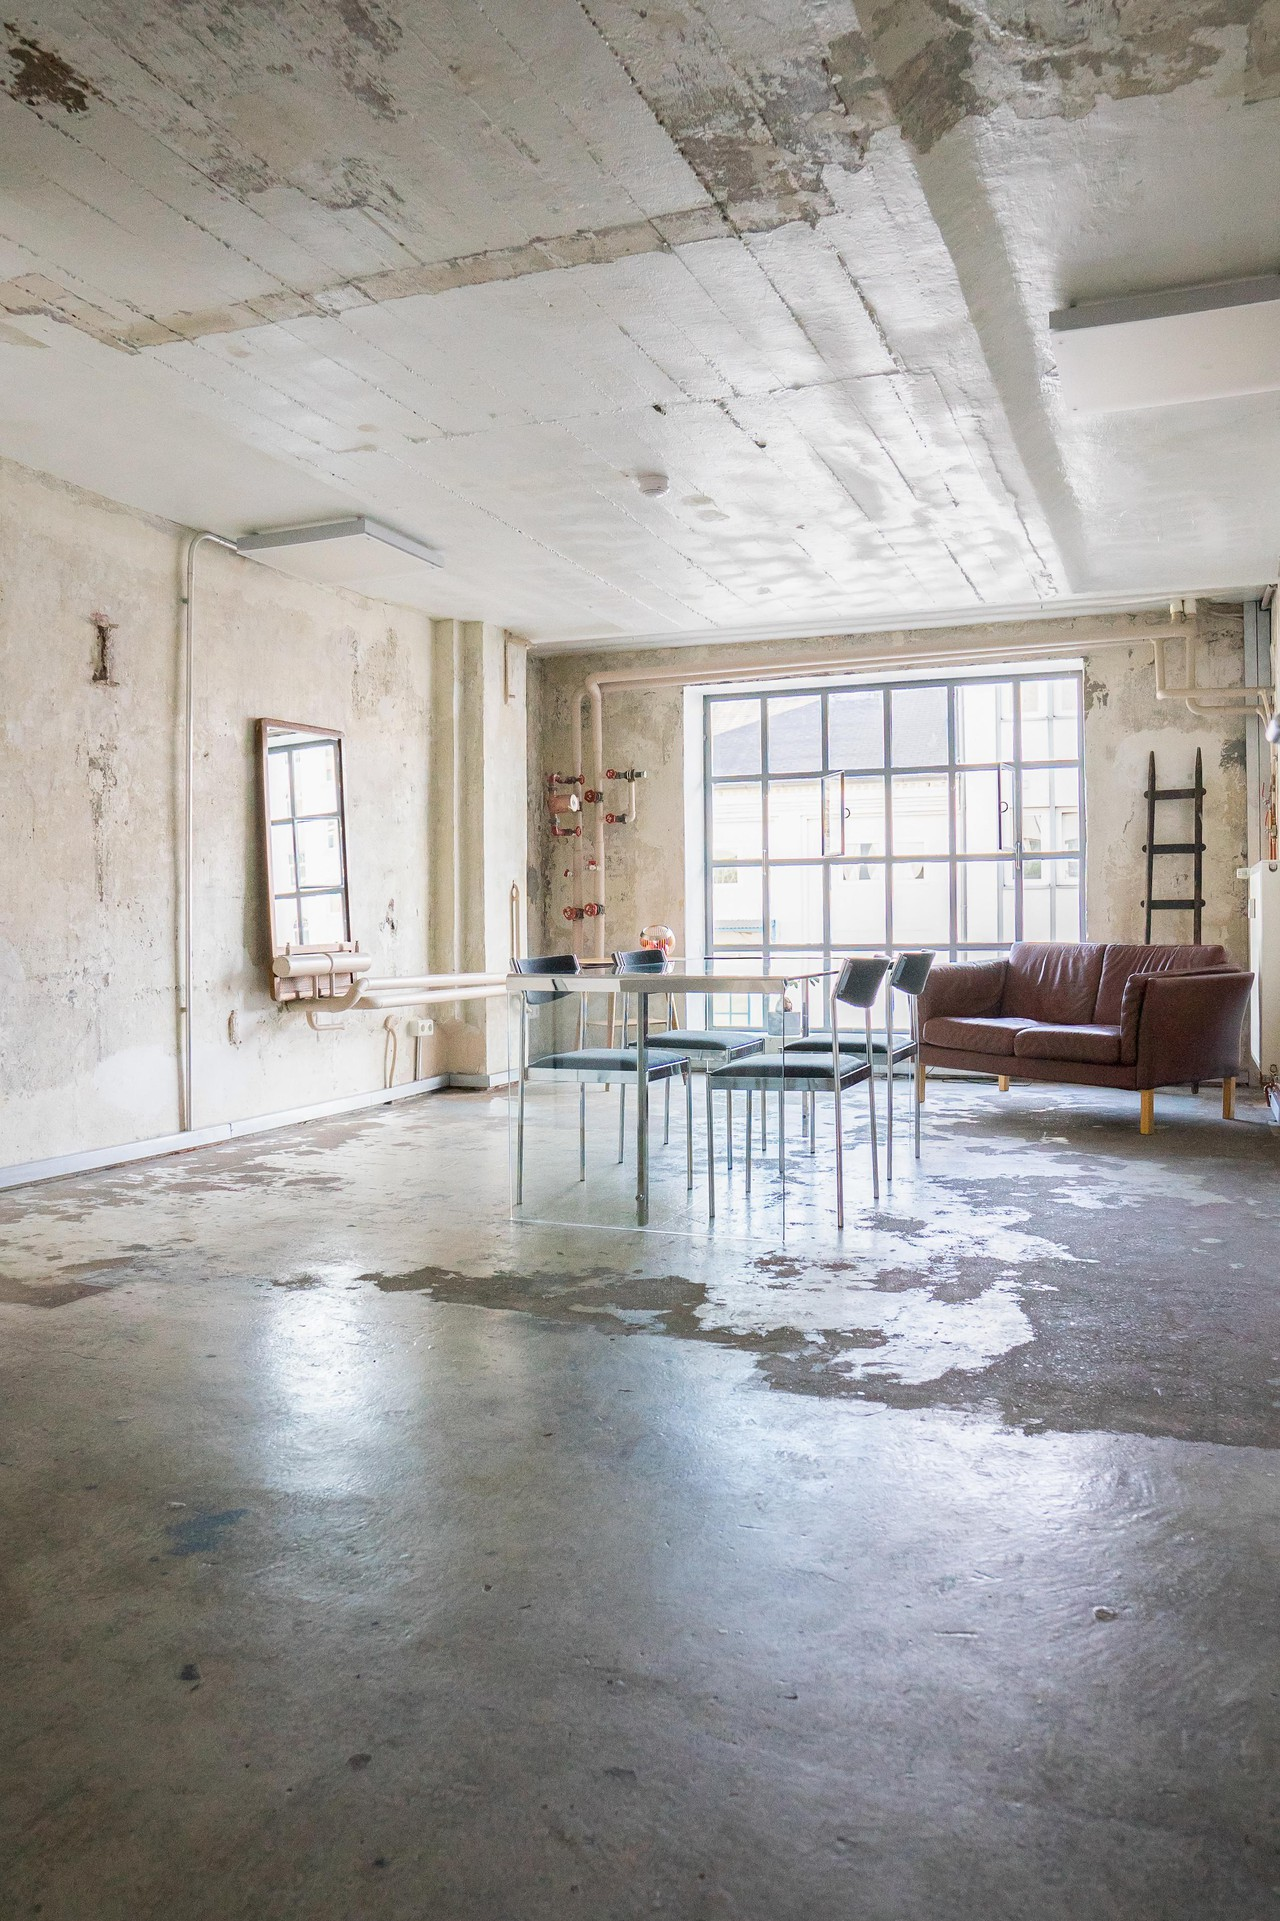 Hamburg training rooms Industrial space Atelier image 0